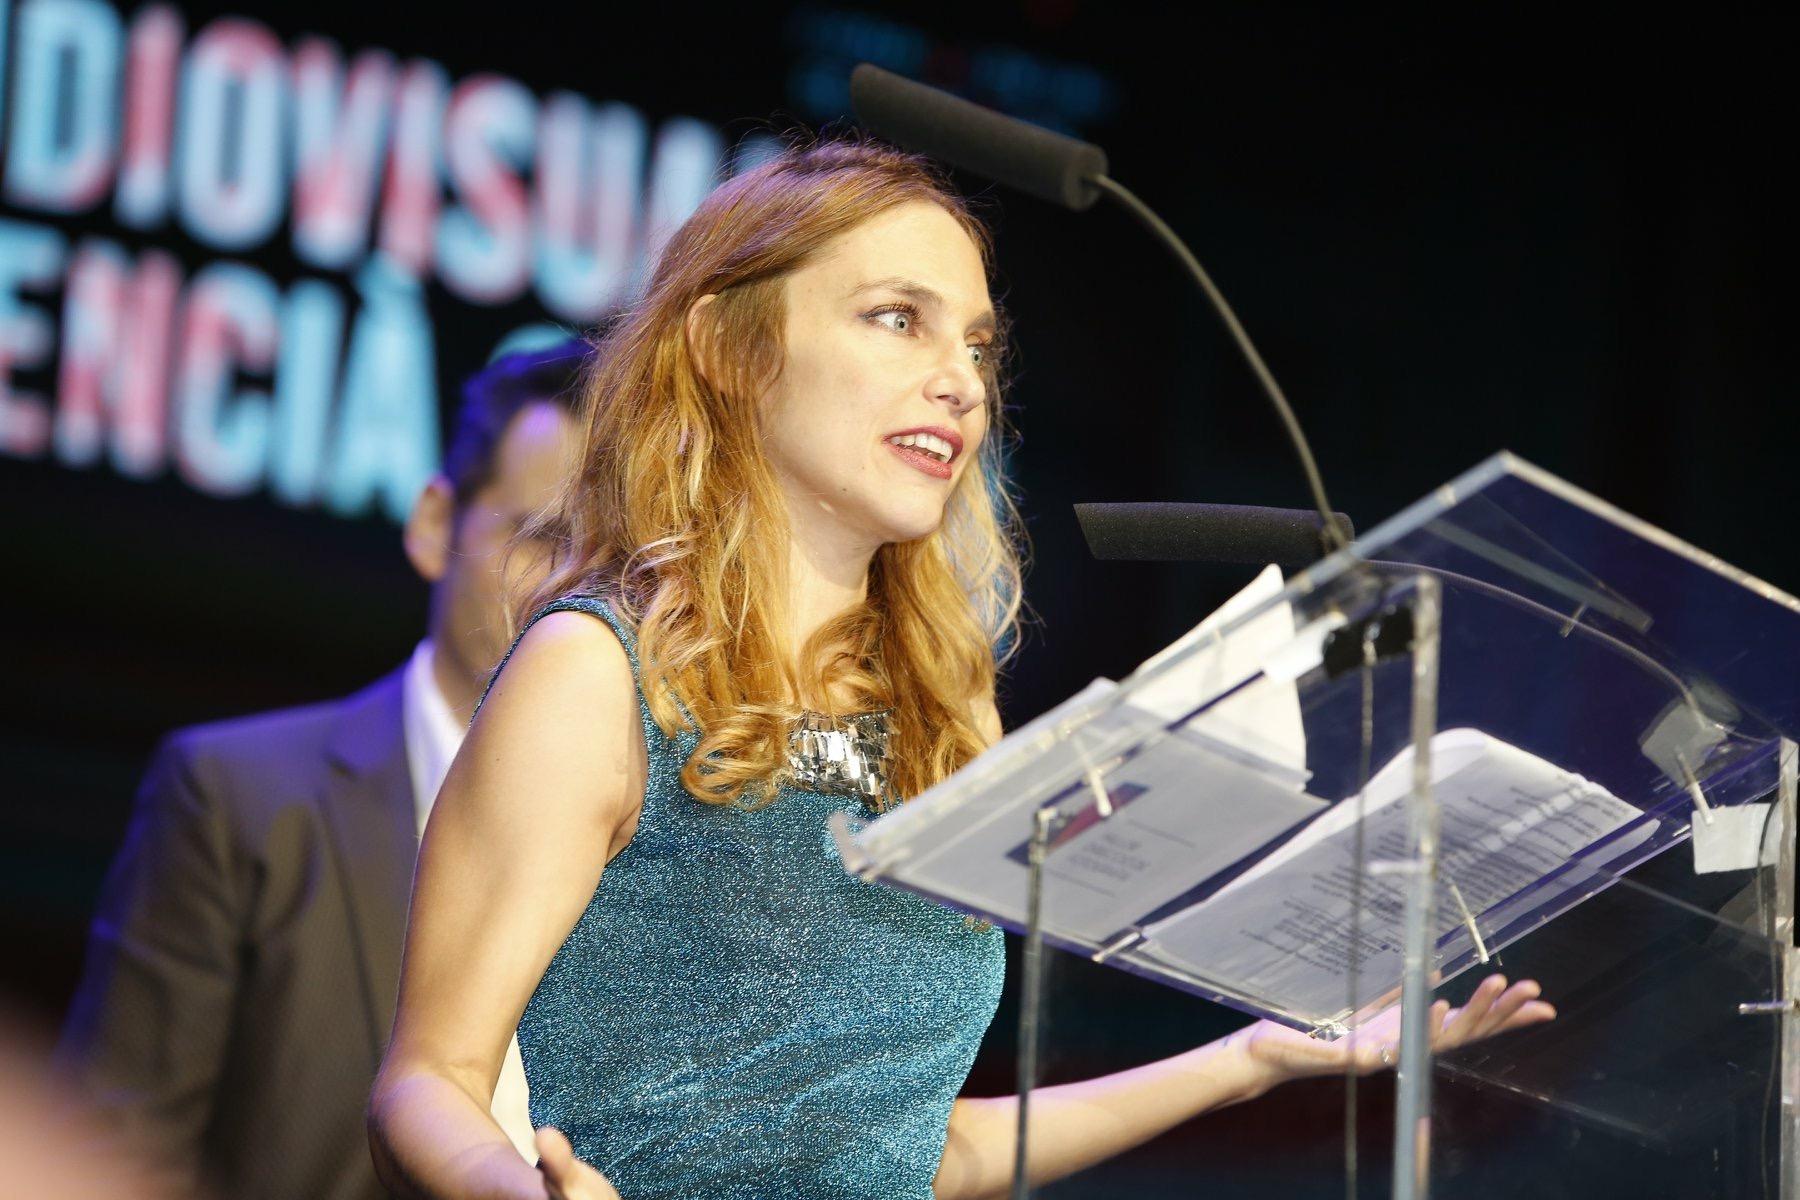 Premio Mejor Actriz Academia Cine Valenc